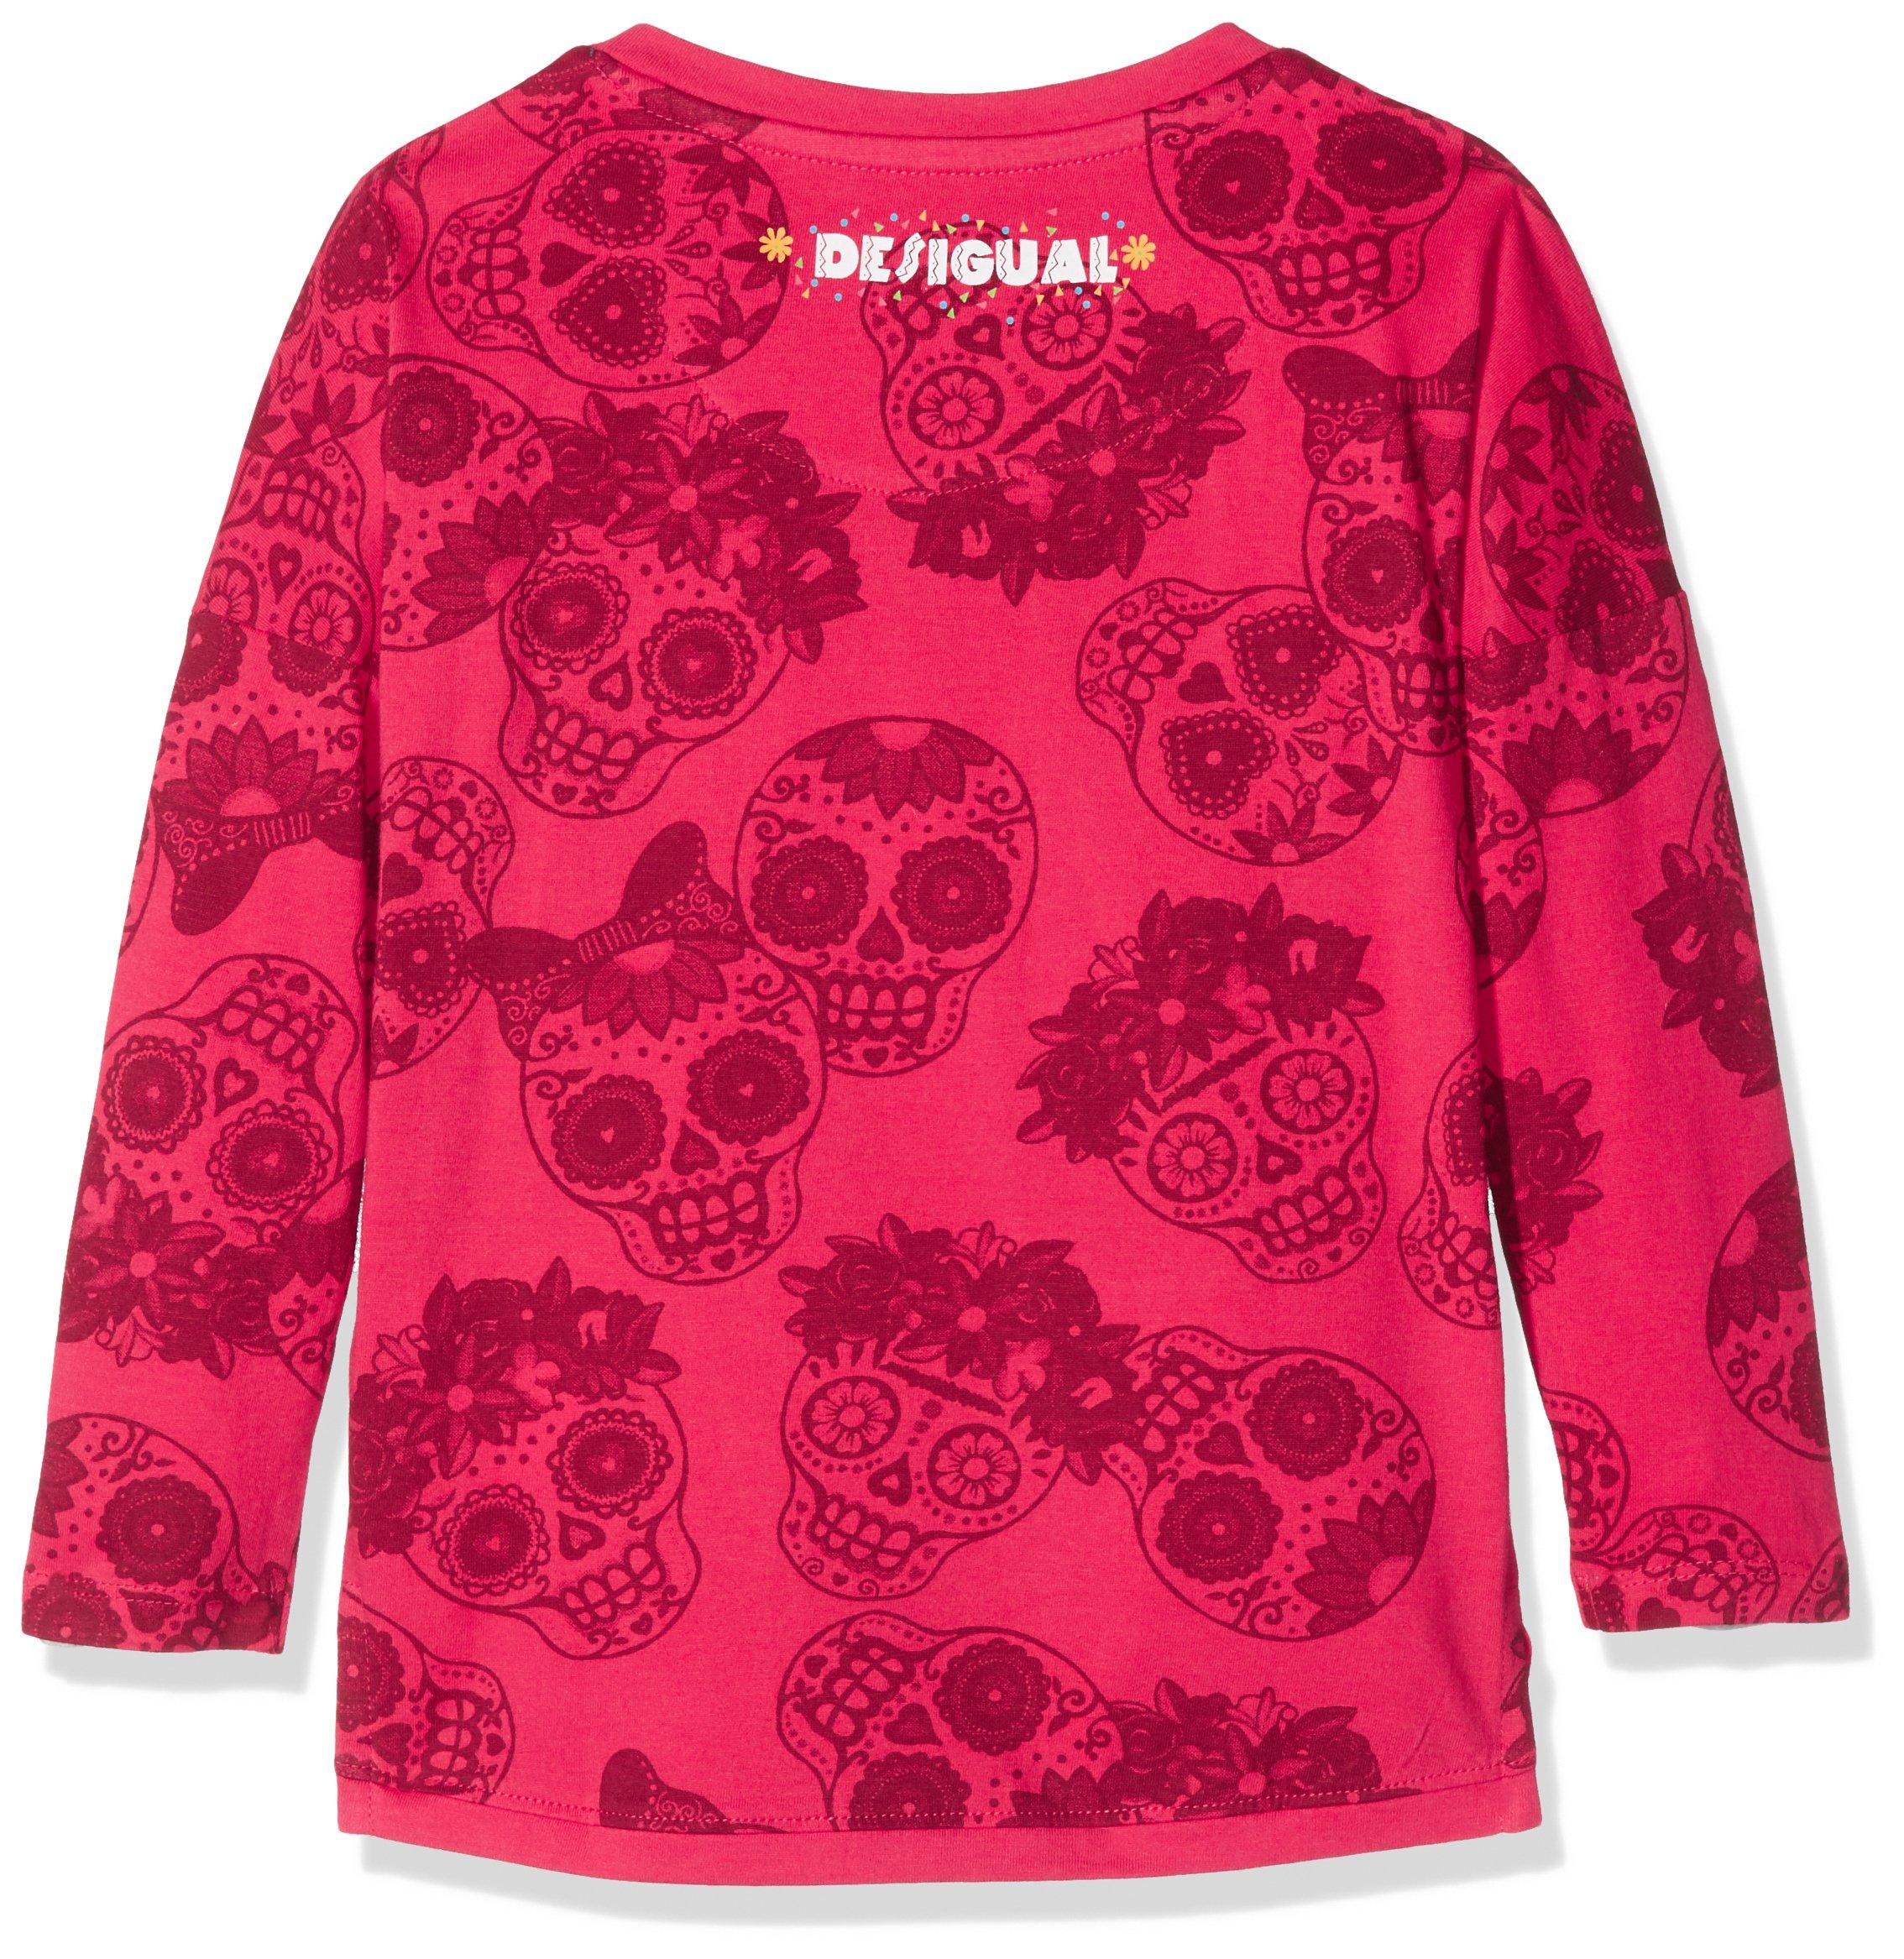 Desigual TS_Georgia Camisa Manga Larga para Niñas